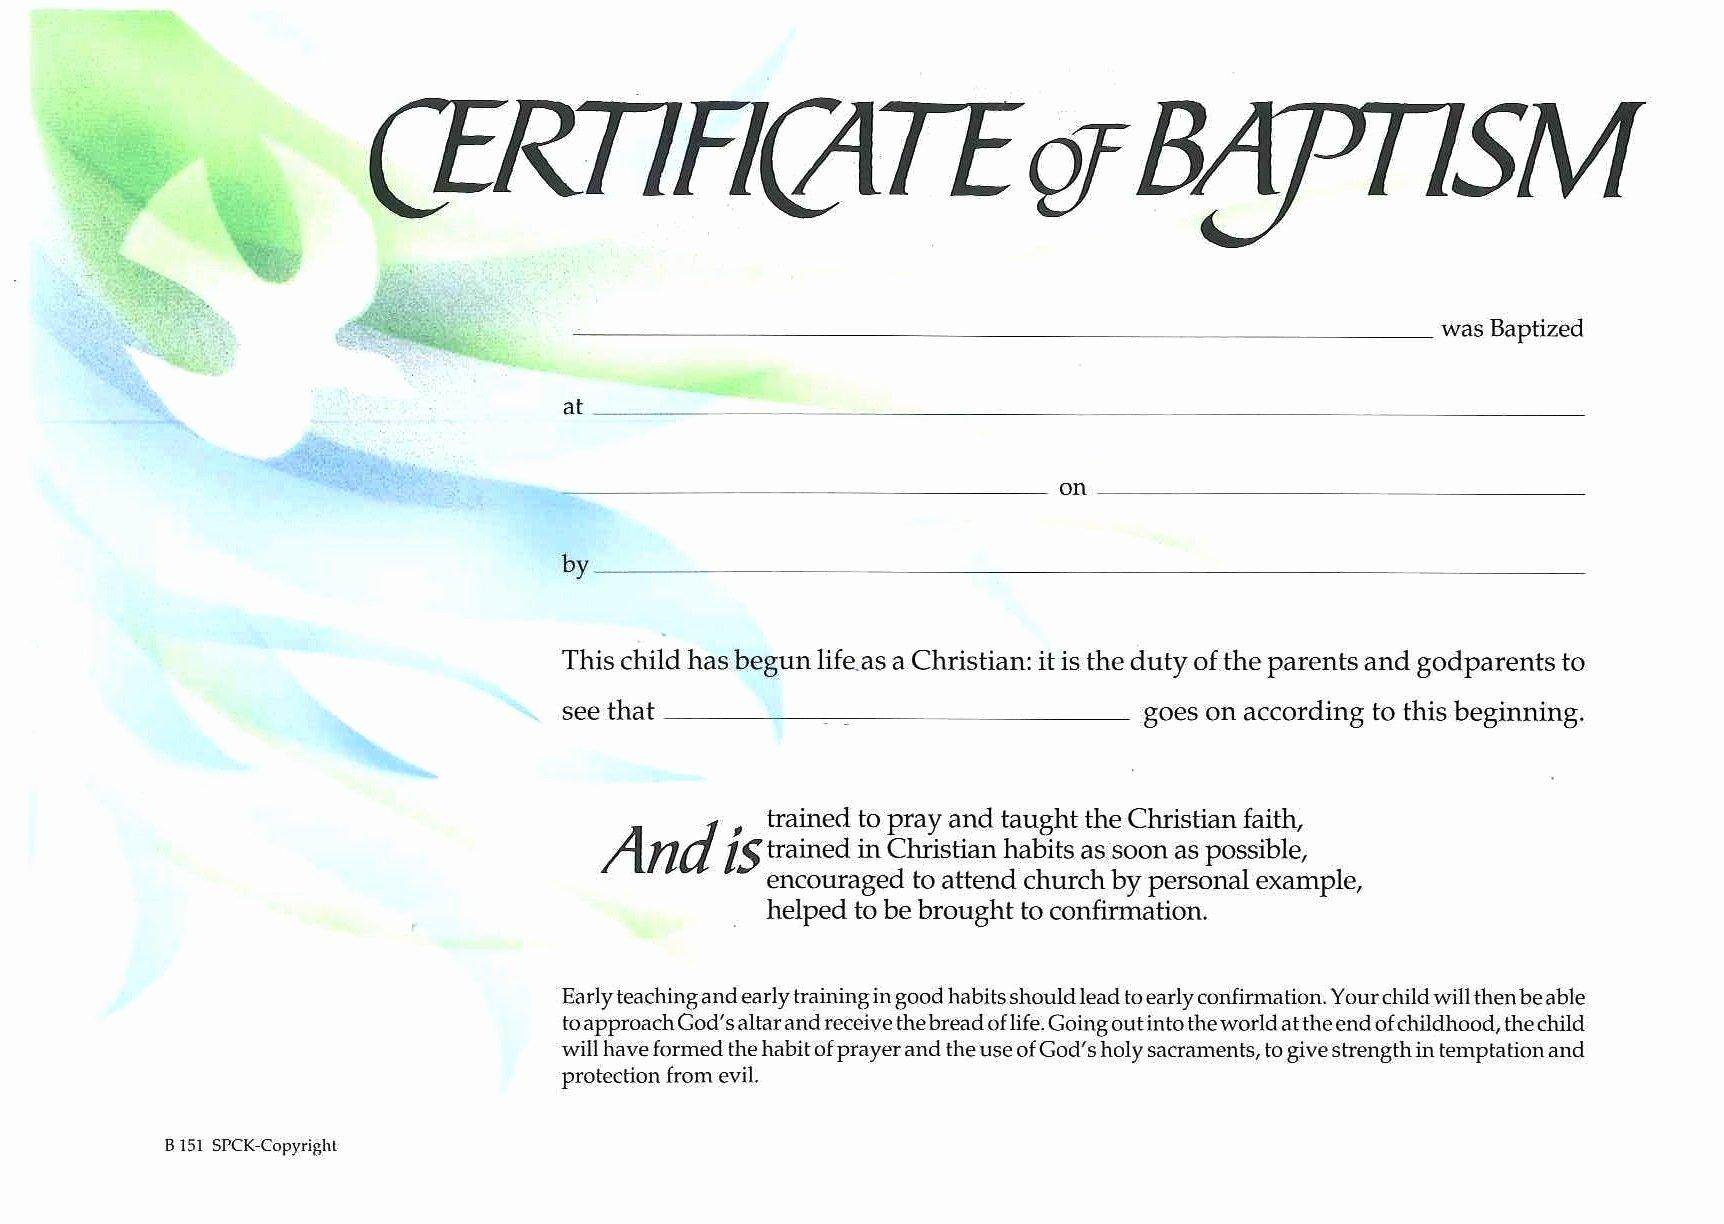 Catholic Baptismal Certificate Template New Baptism Certificate Xp4eamuz Sunday School